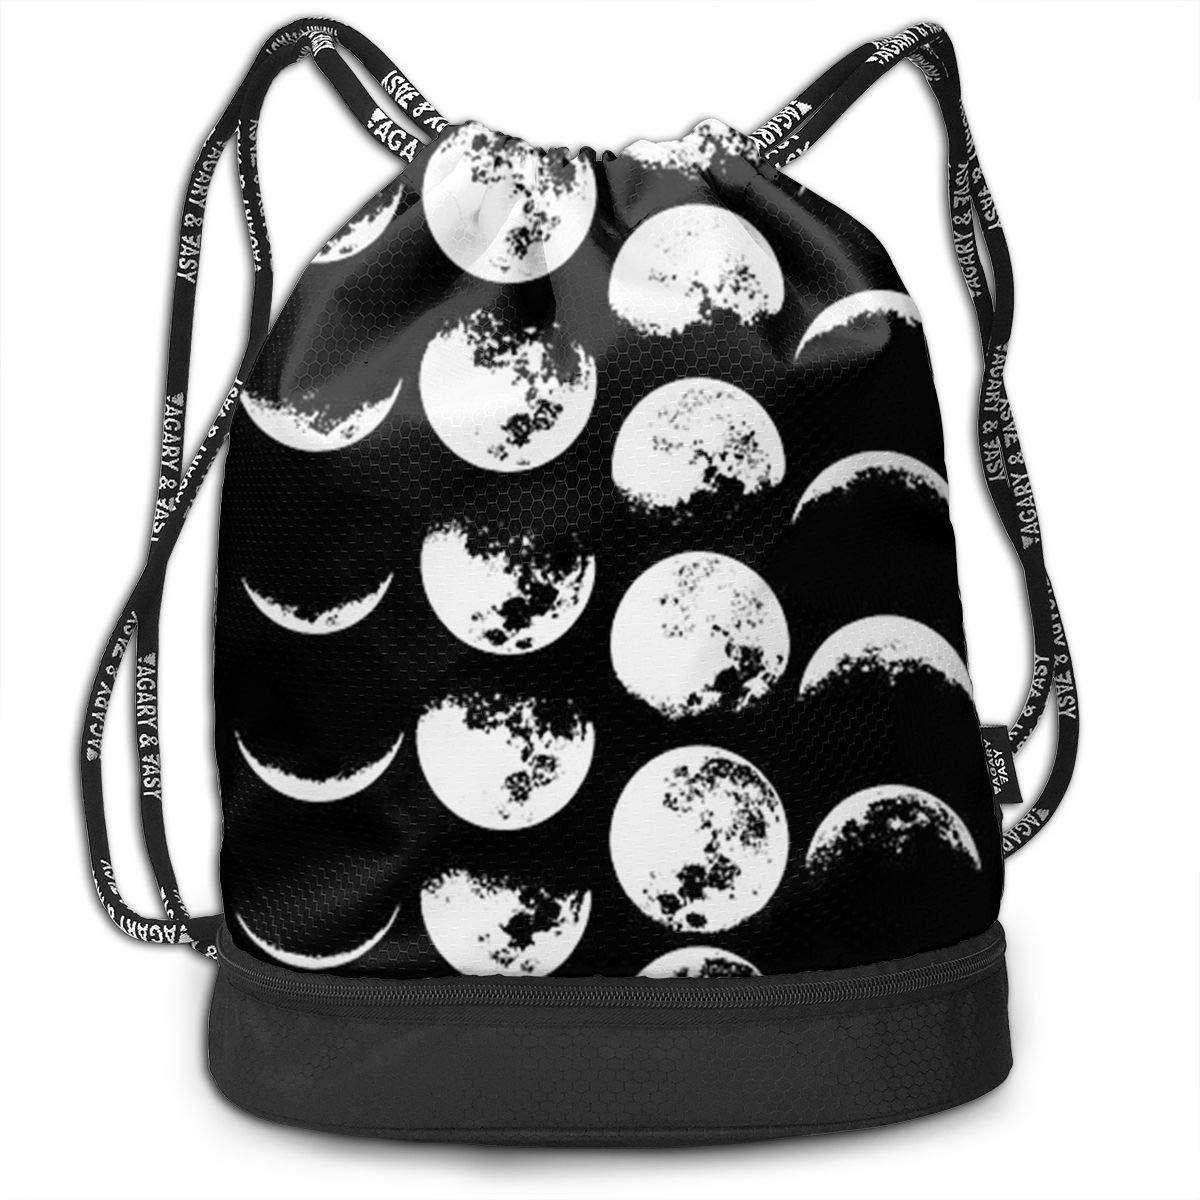 Moon Phases Cinch Backpack Sackpack Tote Sack Zol1Q Lightweight Waterproof Large Storage Drawstring Bag for Men /& Women